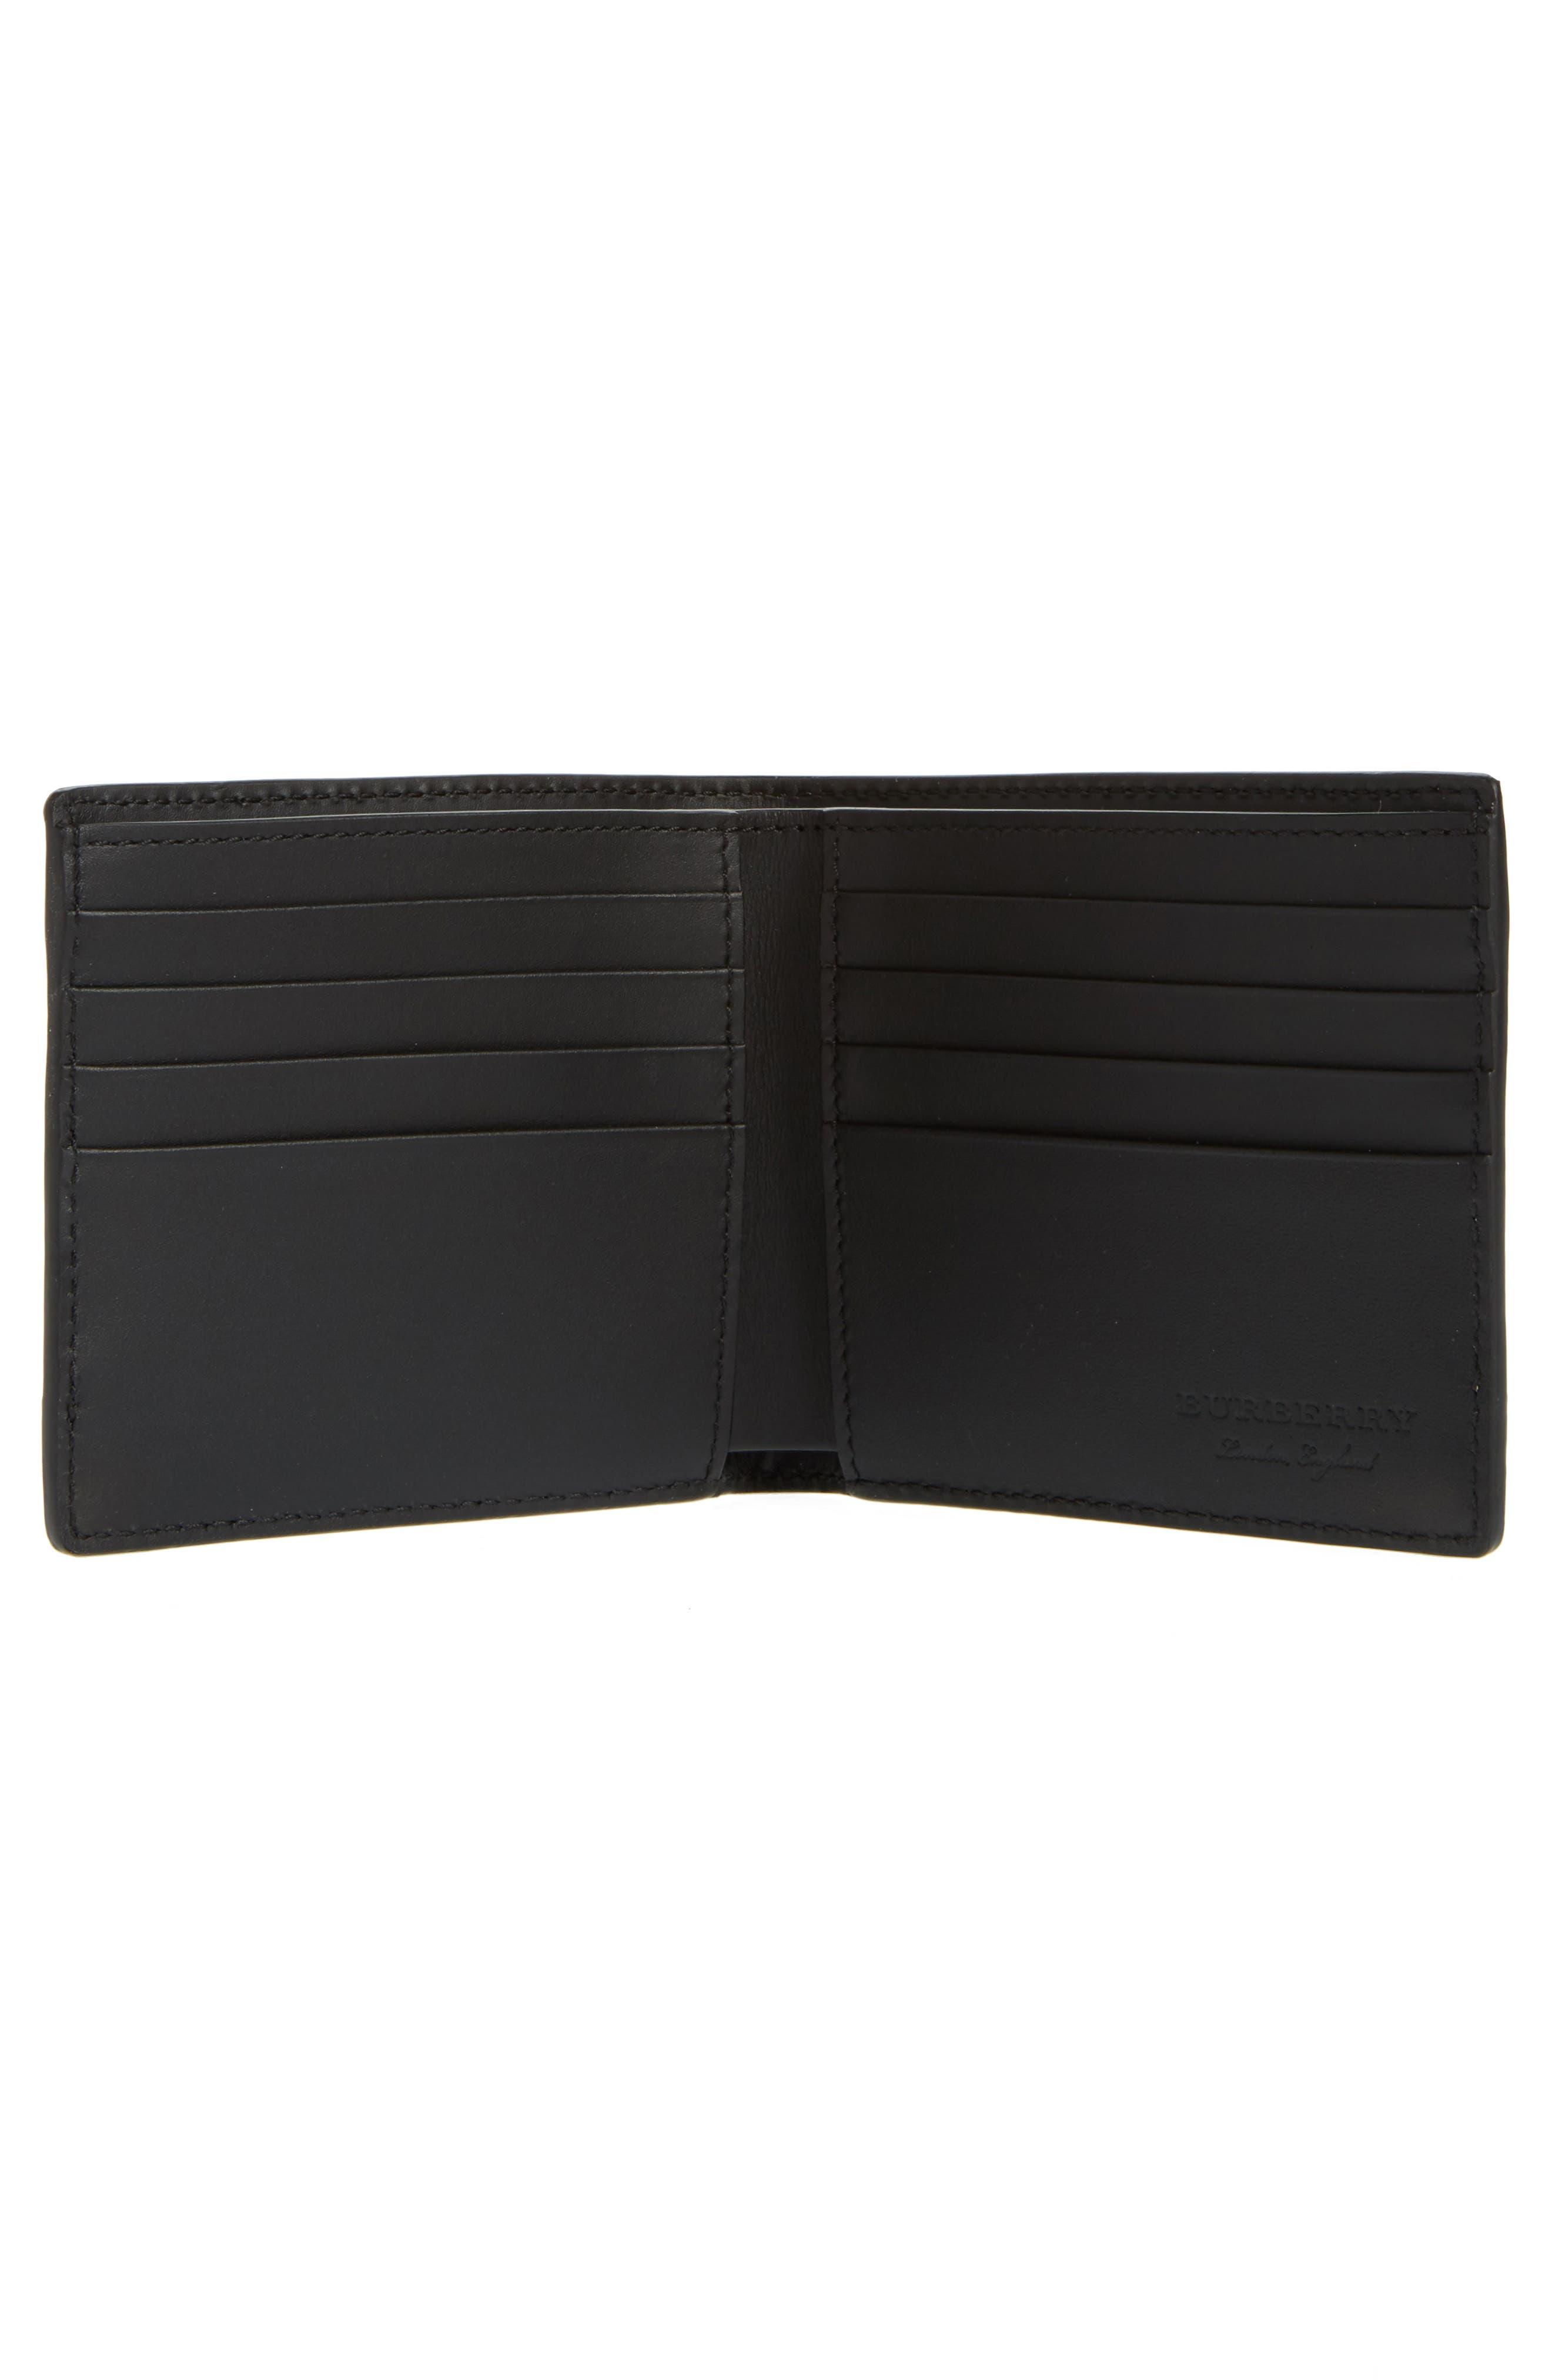 Haymarket Check Wallet,                             Alternate thumbnail 3, color,                             Black